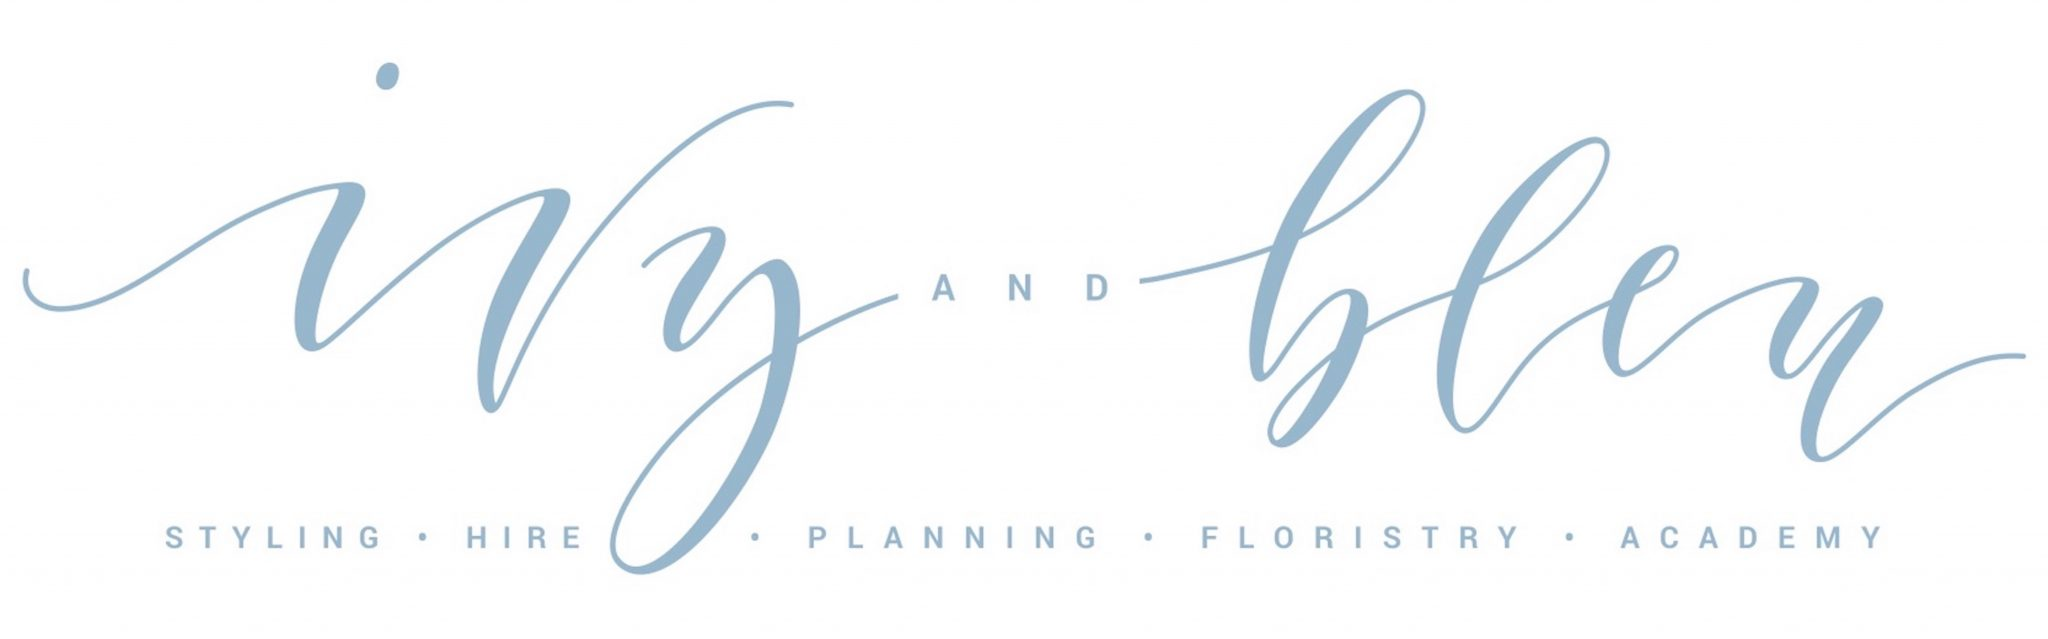 Website-logo-vector-copy-2.jpg